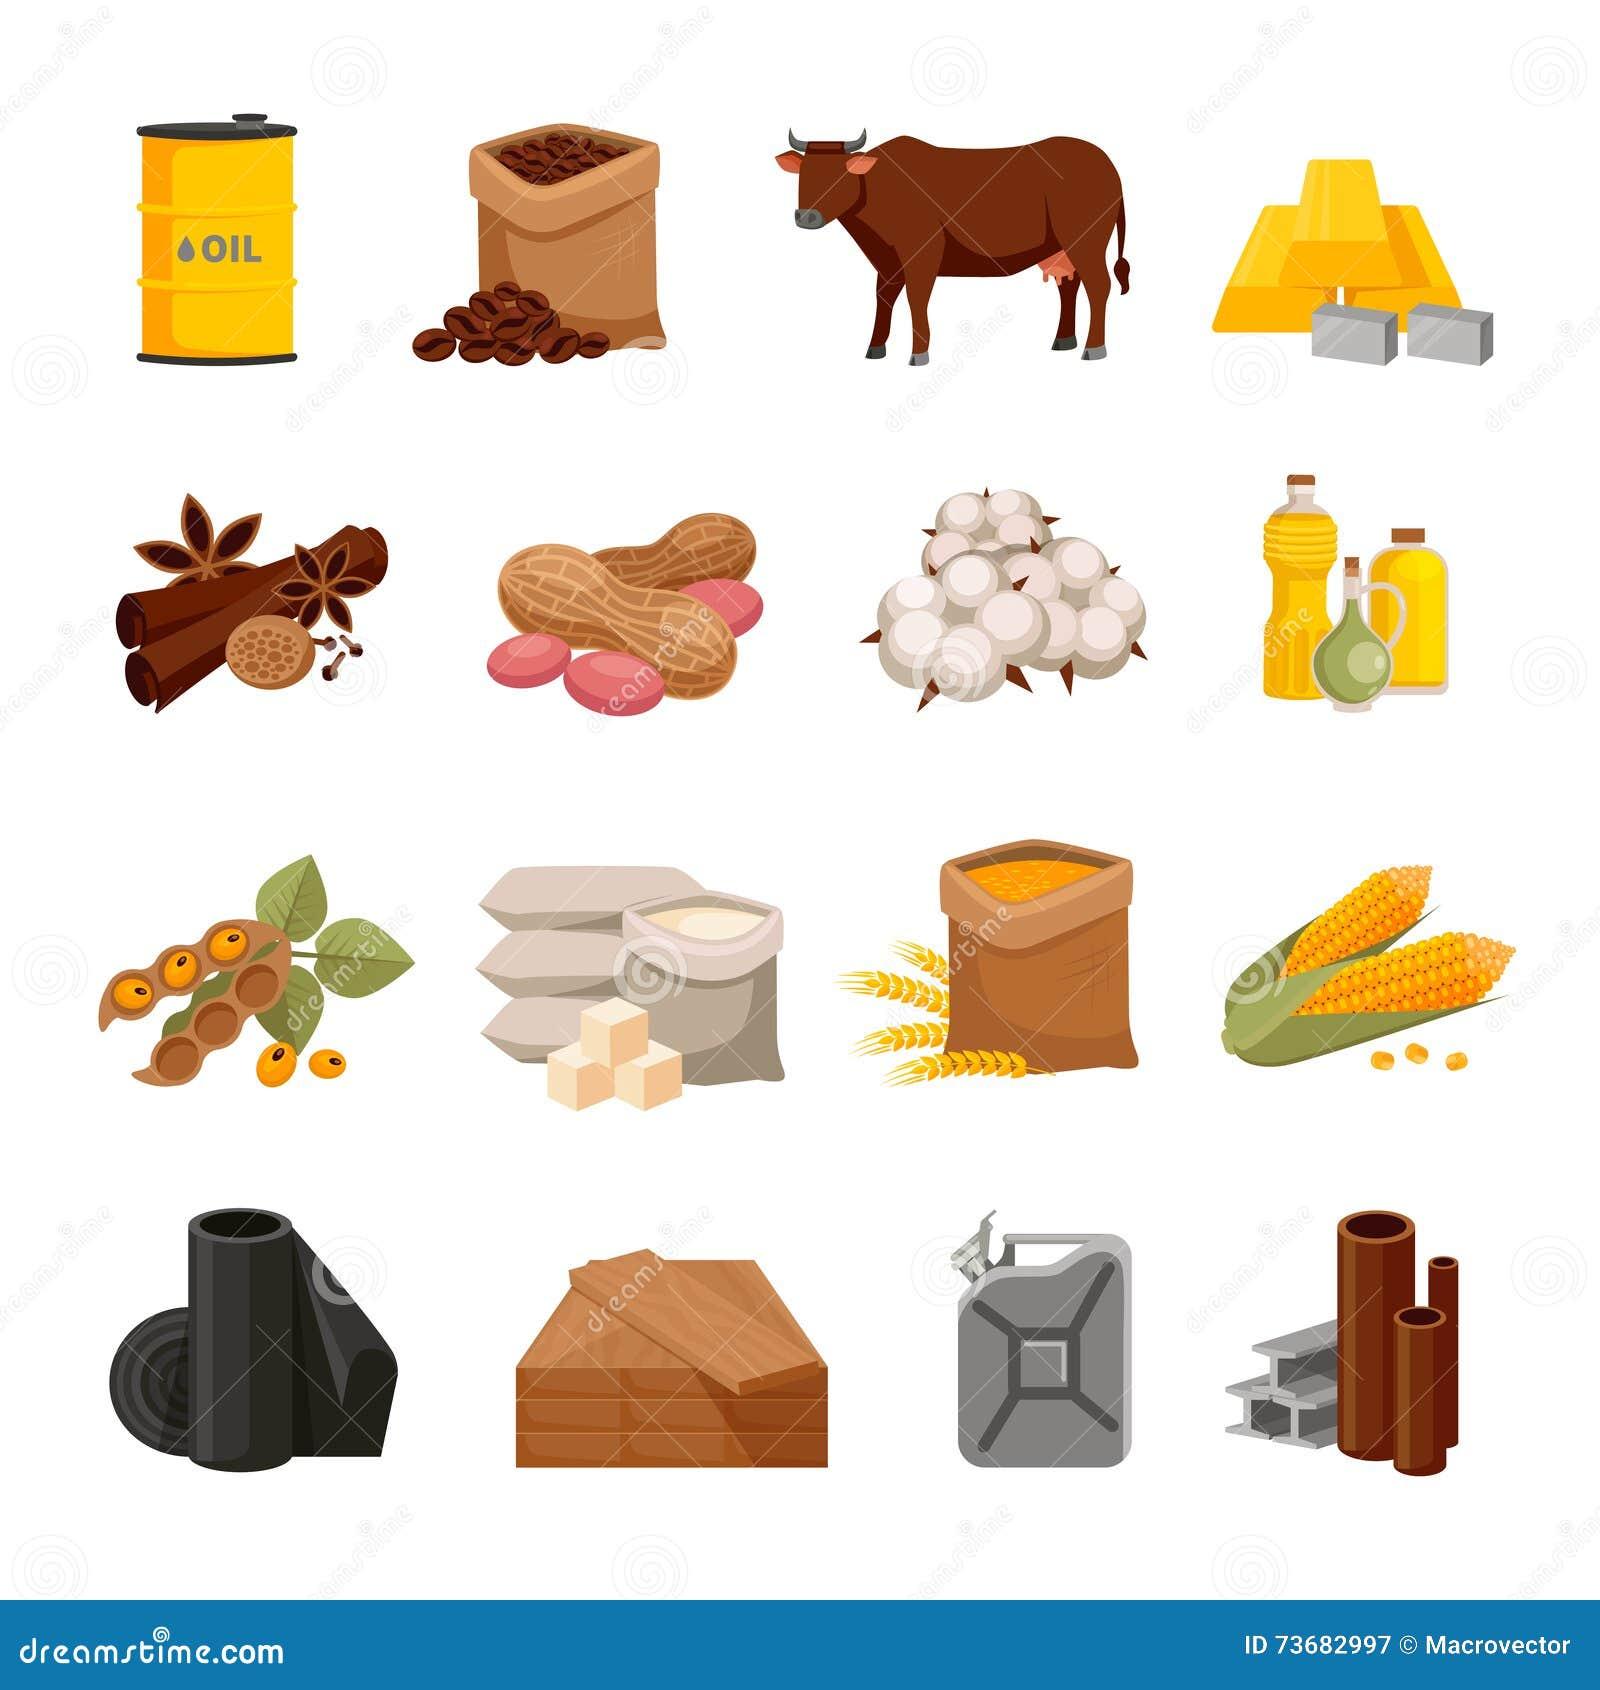 Top stories in Commodities